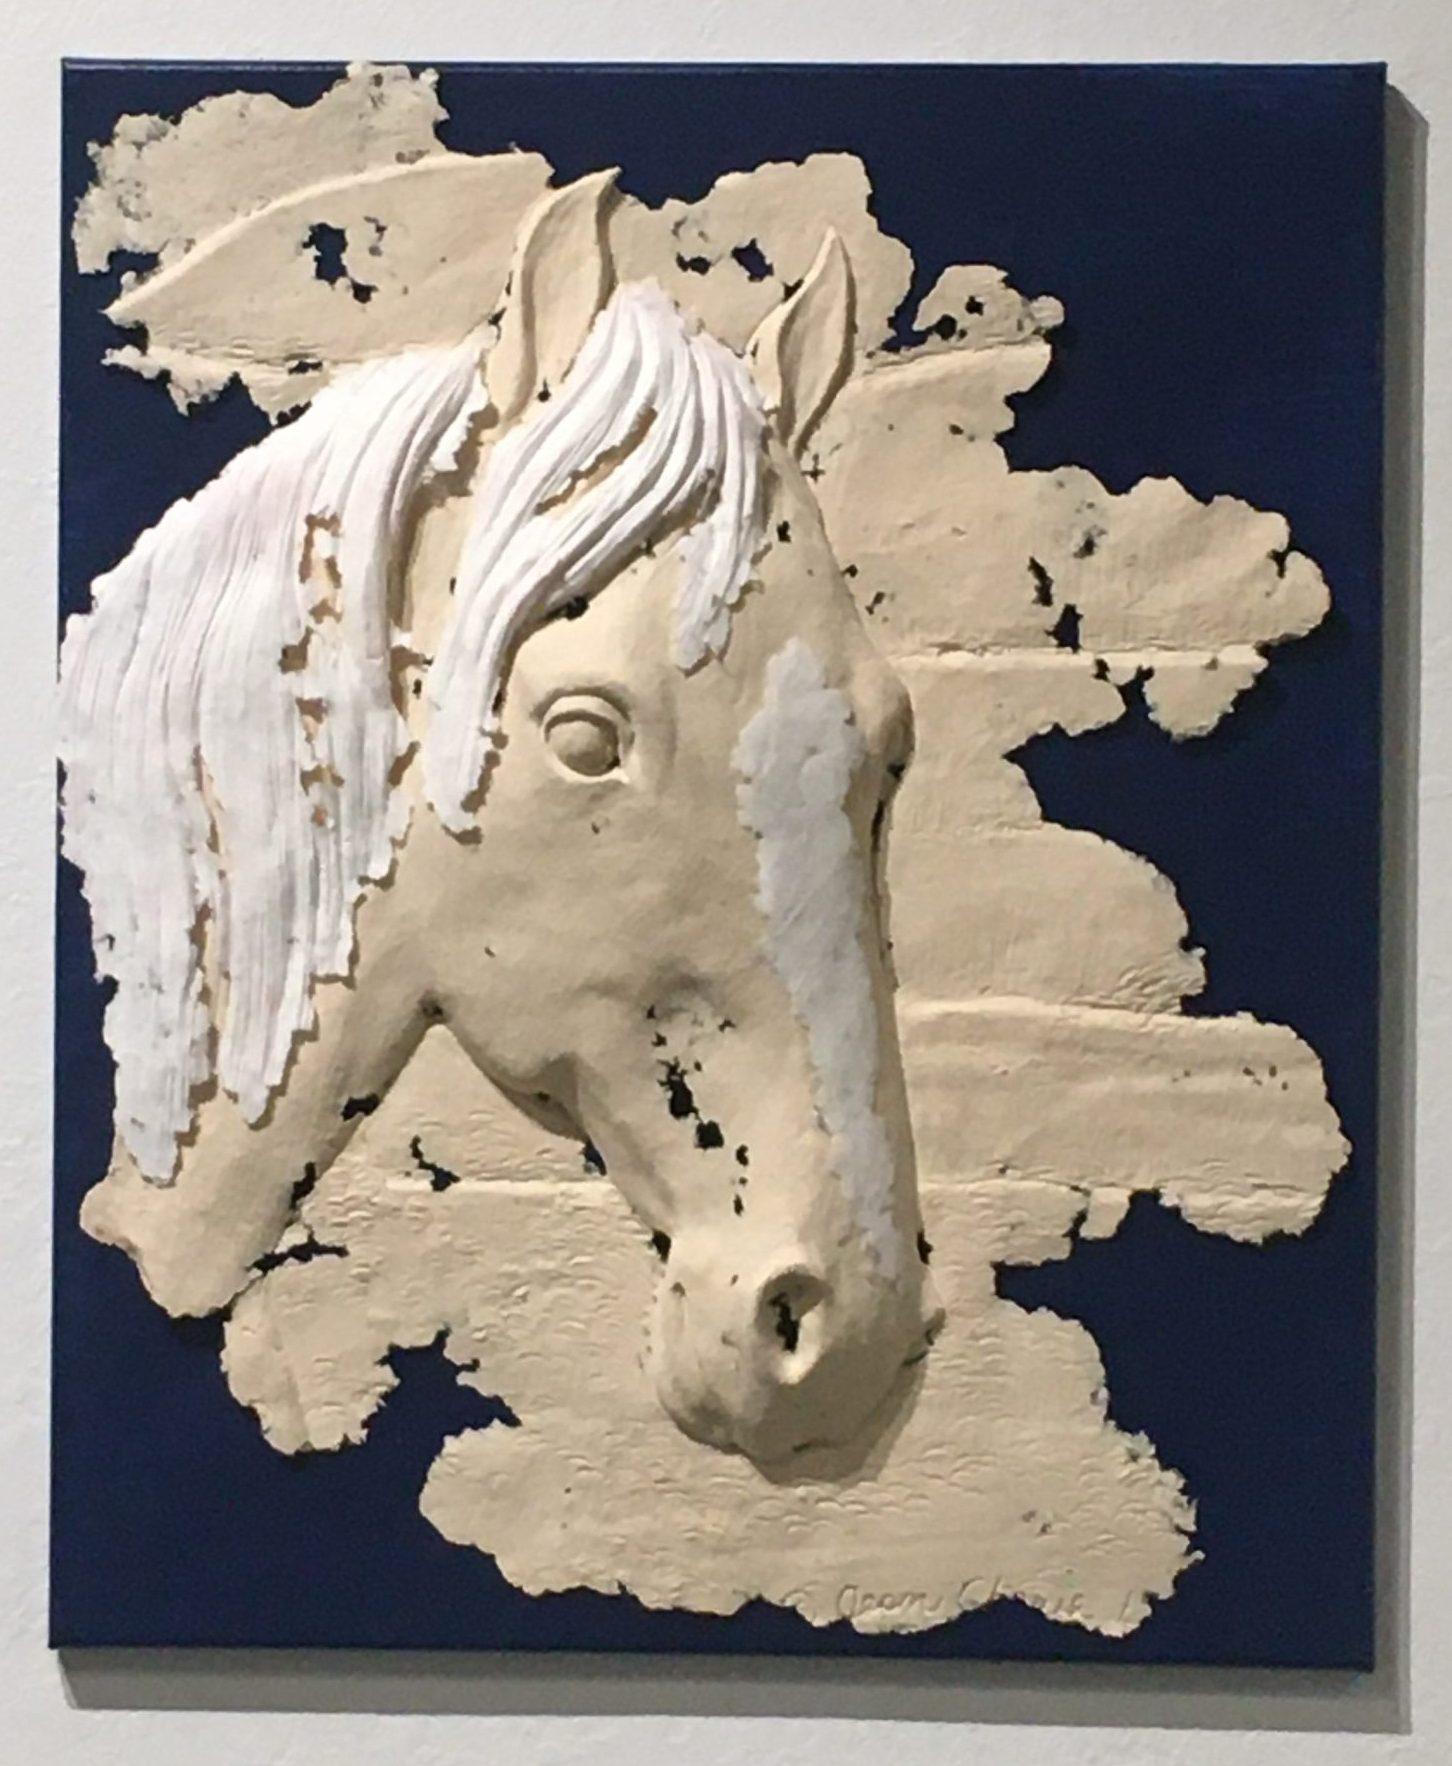 Jean Cherie's Horse Show Retrospective every Sunday